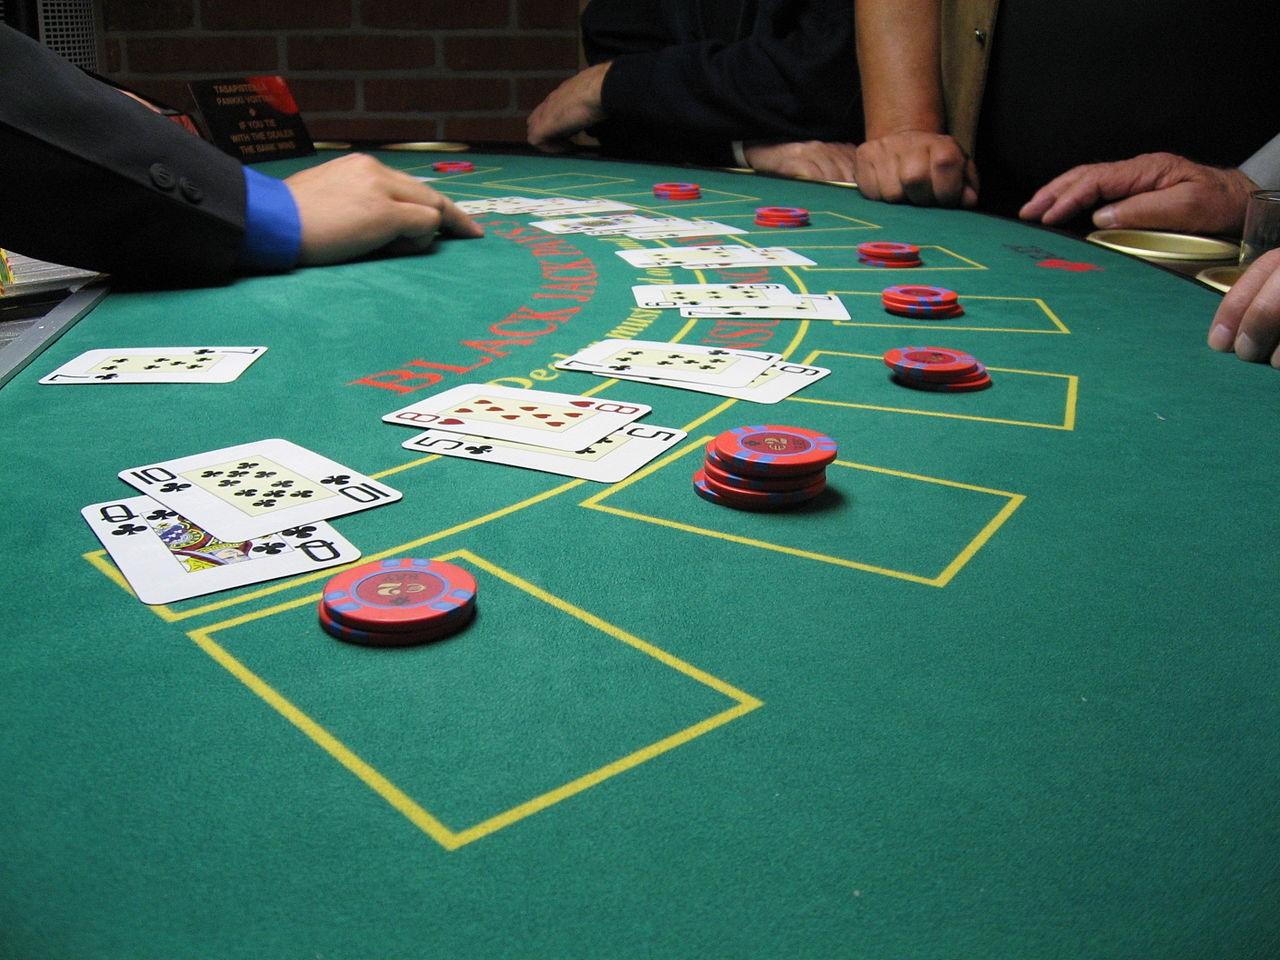 Blackjack card game in land-based casino